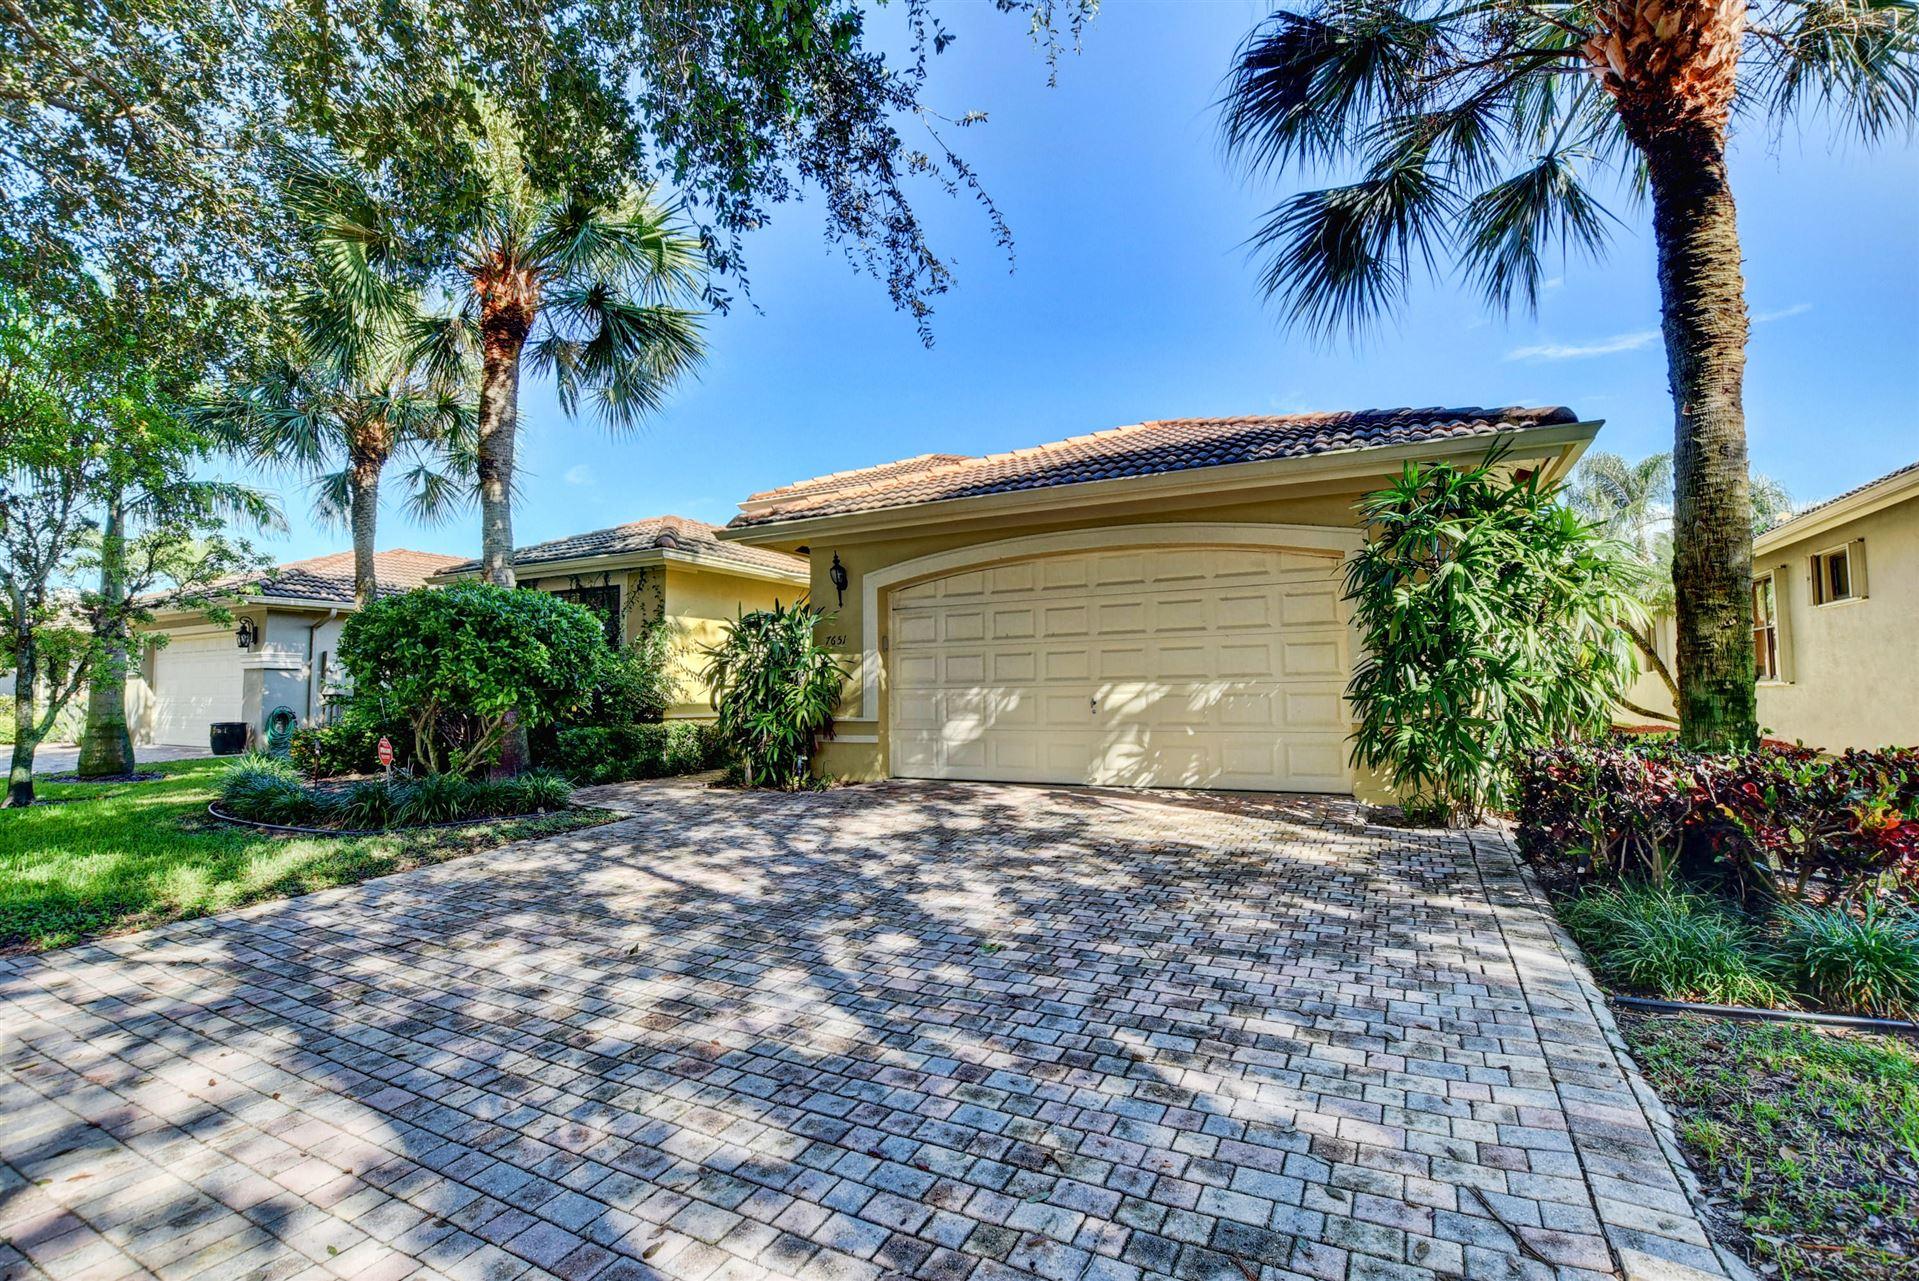 7651 Via Grande, Boynton Beach, FL 33437 - #: RX-10659460